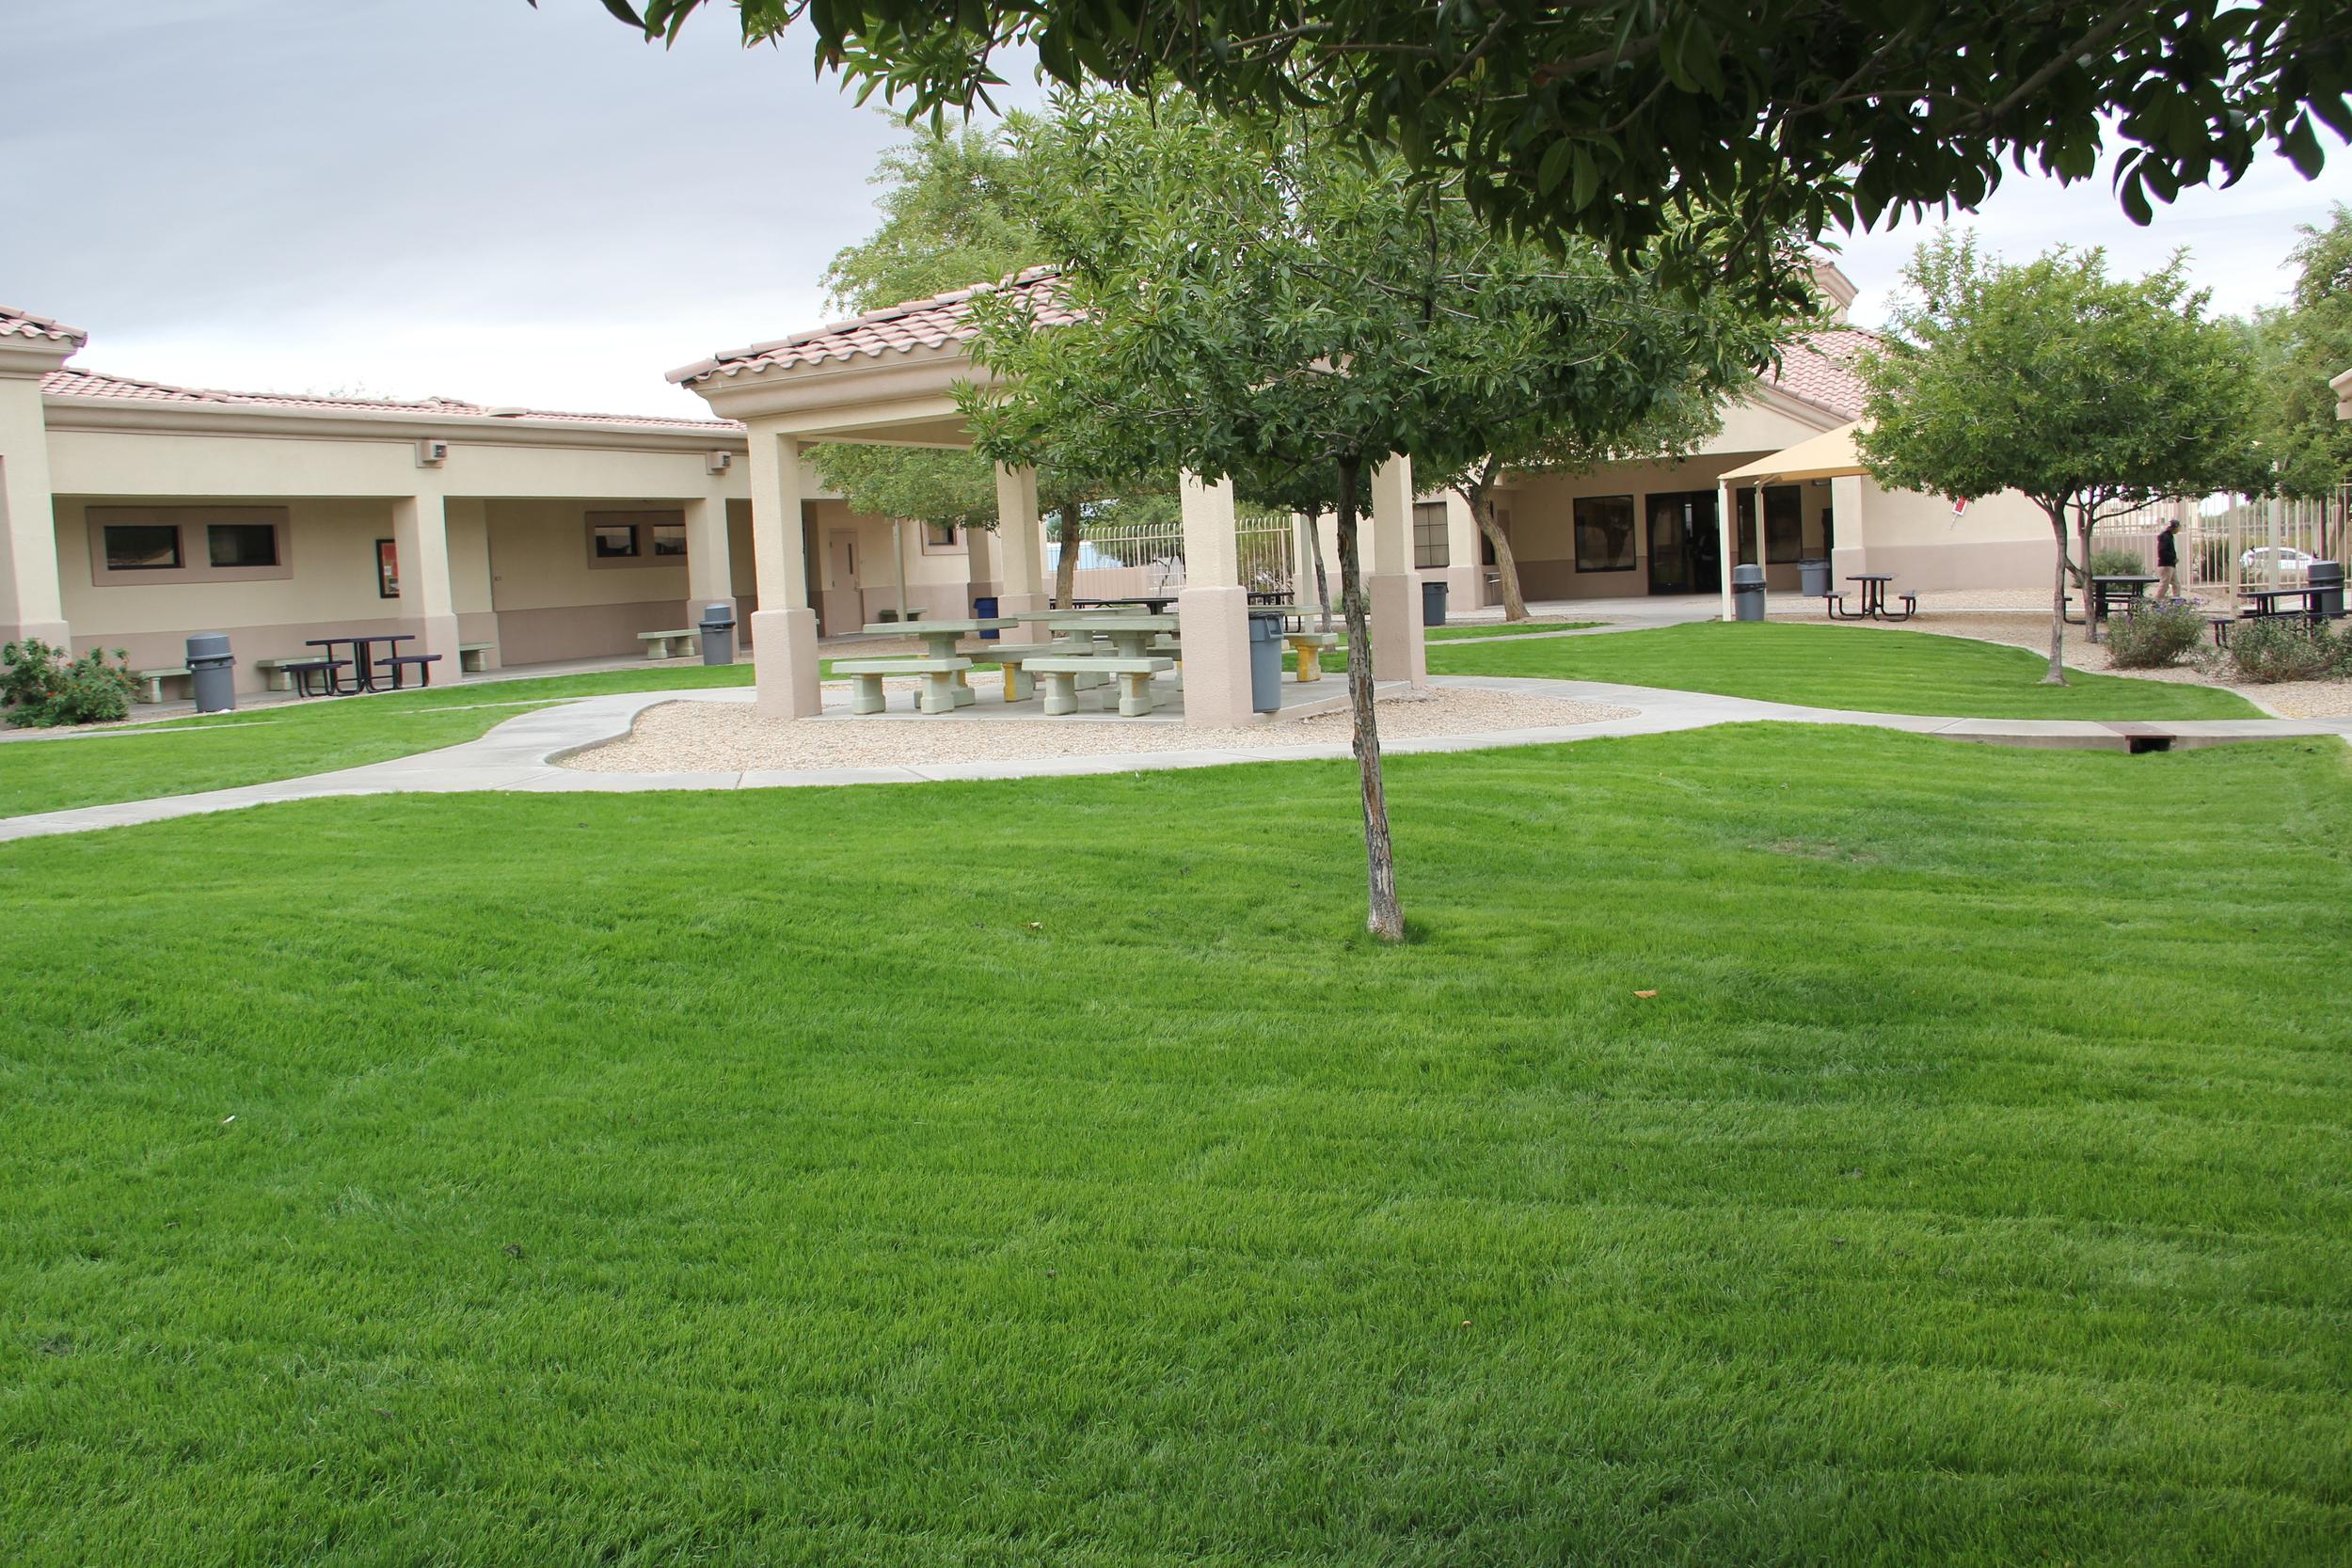 Commercial-Landscaping-Arizona.JPG